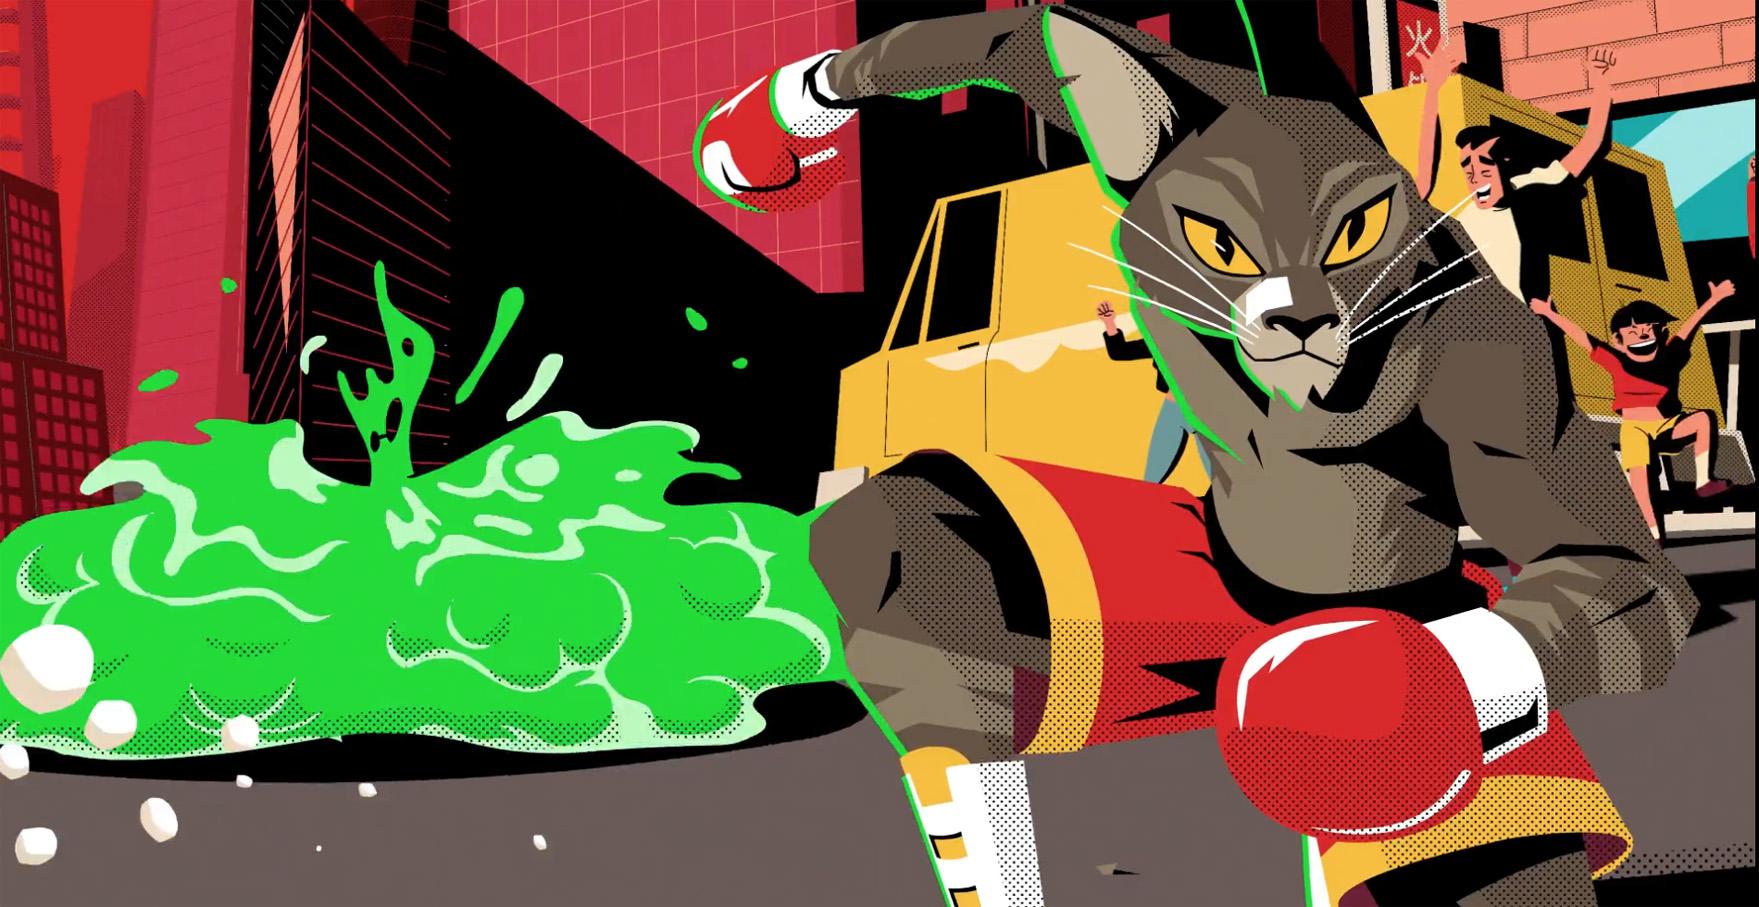 Microbrewery Boxing Cat packs a punch via new R/GA Shanghai rebrand campaign